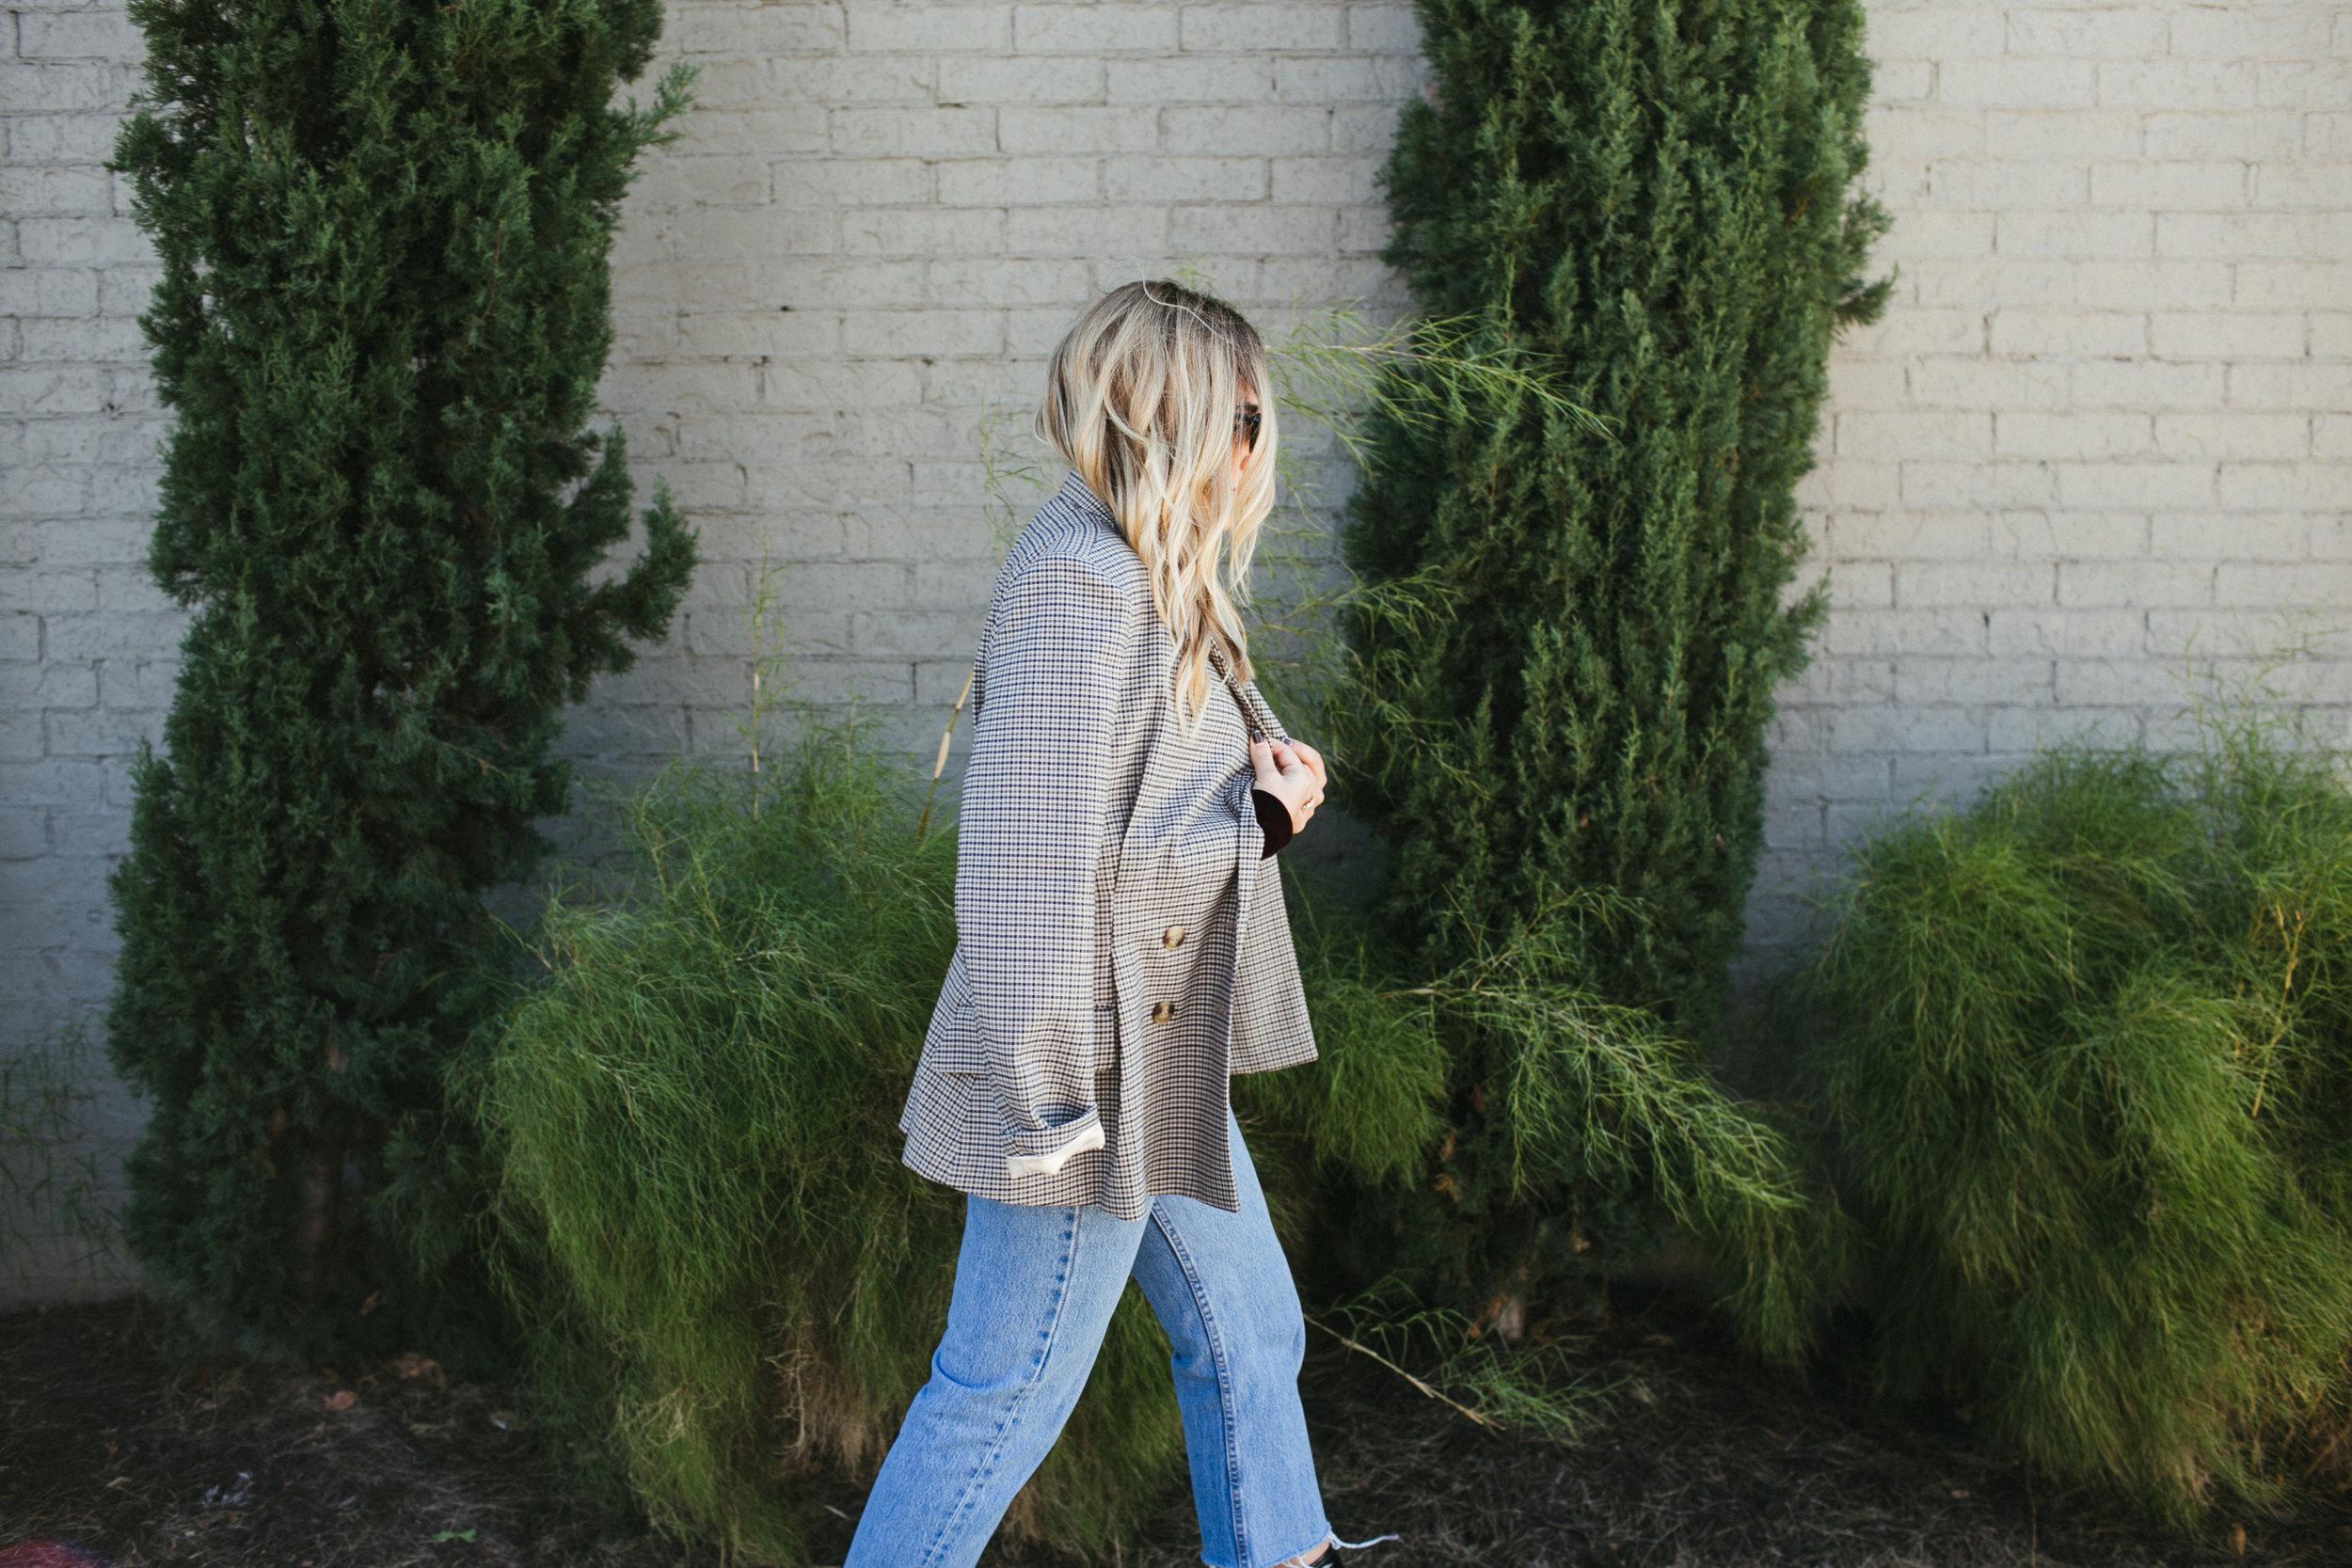 Paige-Newton-Lifestyle-Fashion-Blogger-Influencer-Photography-024.jpg